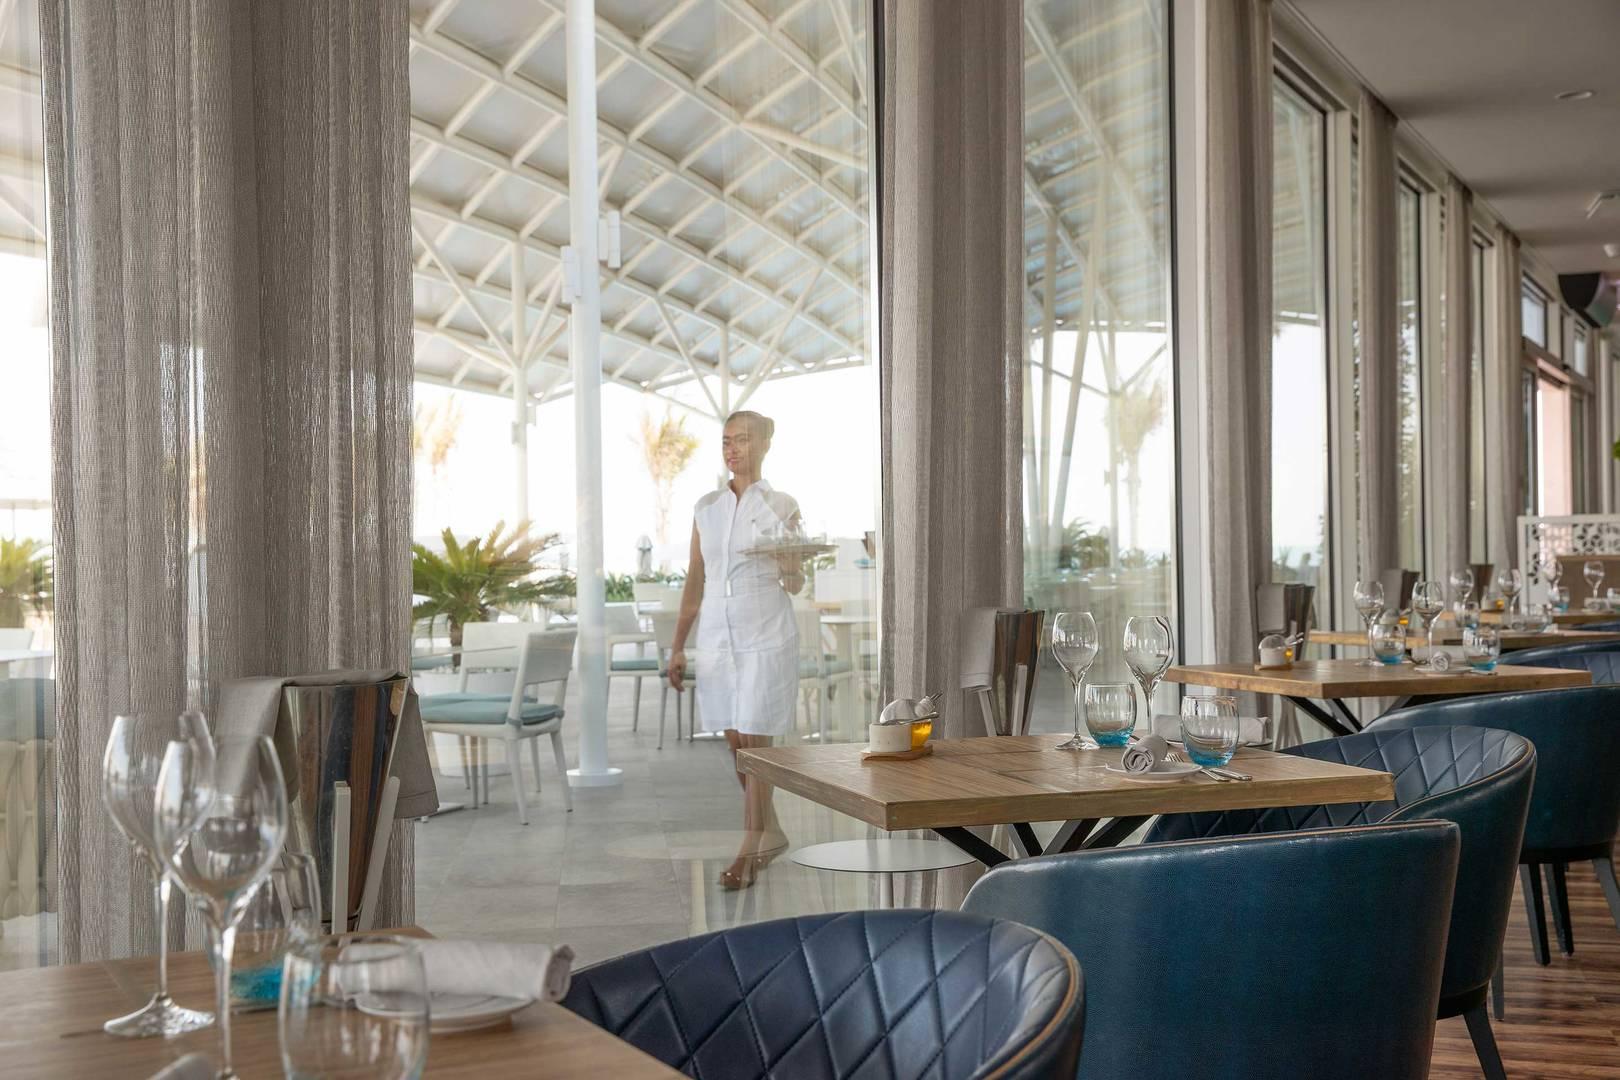 https://cdn.jumeirah.com/-/mediadh/DH/Hospitality/Jumeirah/Restaurants/Dubai/Buj-Al-Arab-Scape-restaurant-and-lounge/Restaurant-Gallery/Burj-Al-Arab-Scape-Window-Seat_6-4.jpg?h=1080&w=1620&hash=94AF2A1264DD7D7827175AE9A77FAE6C